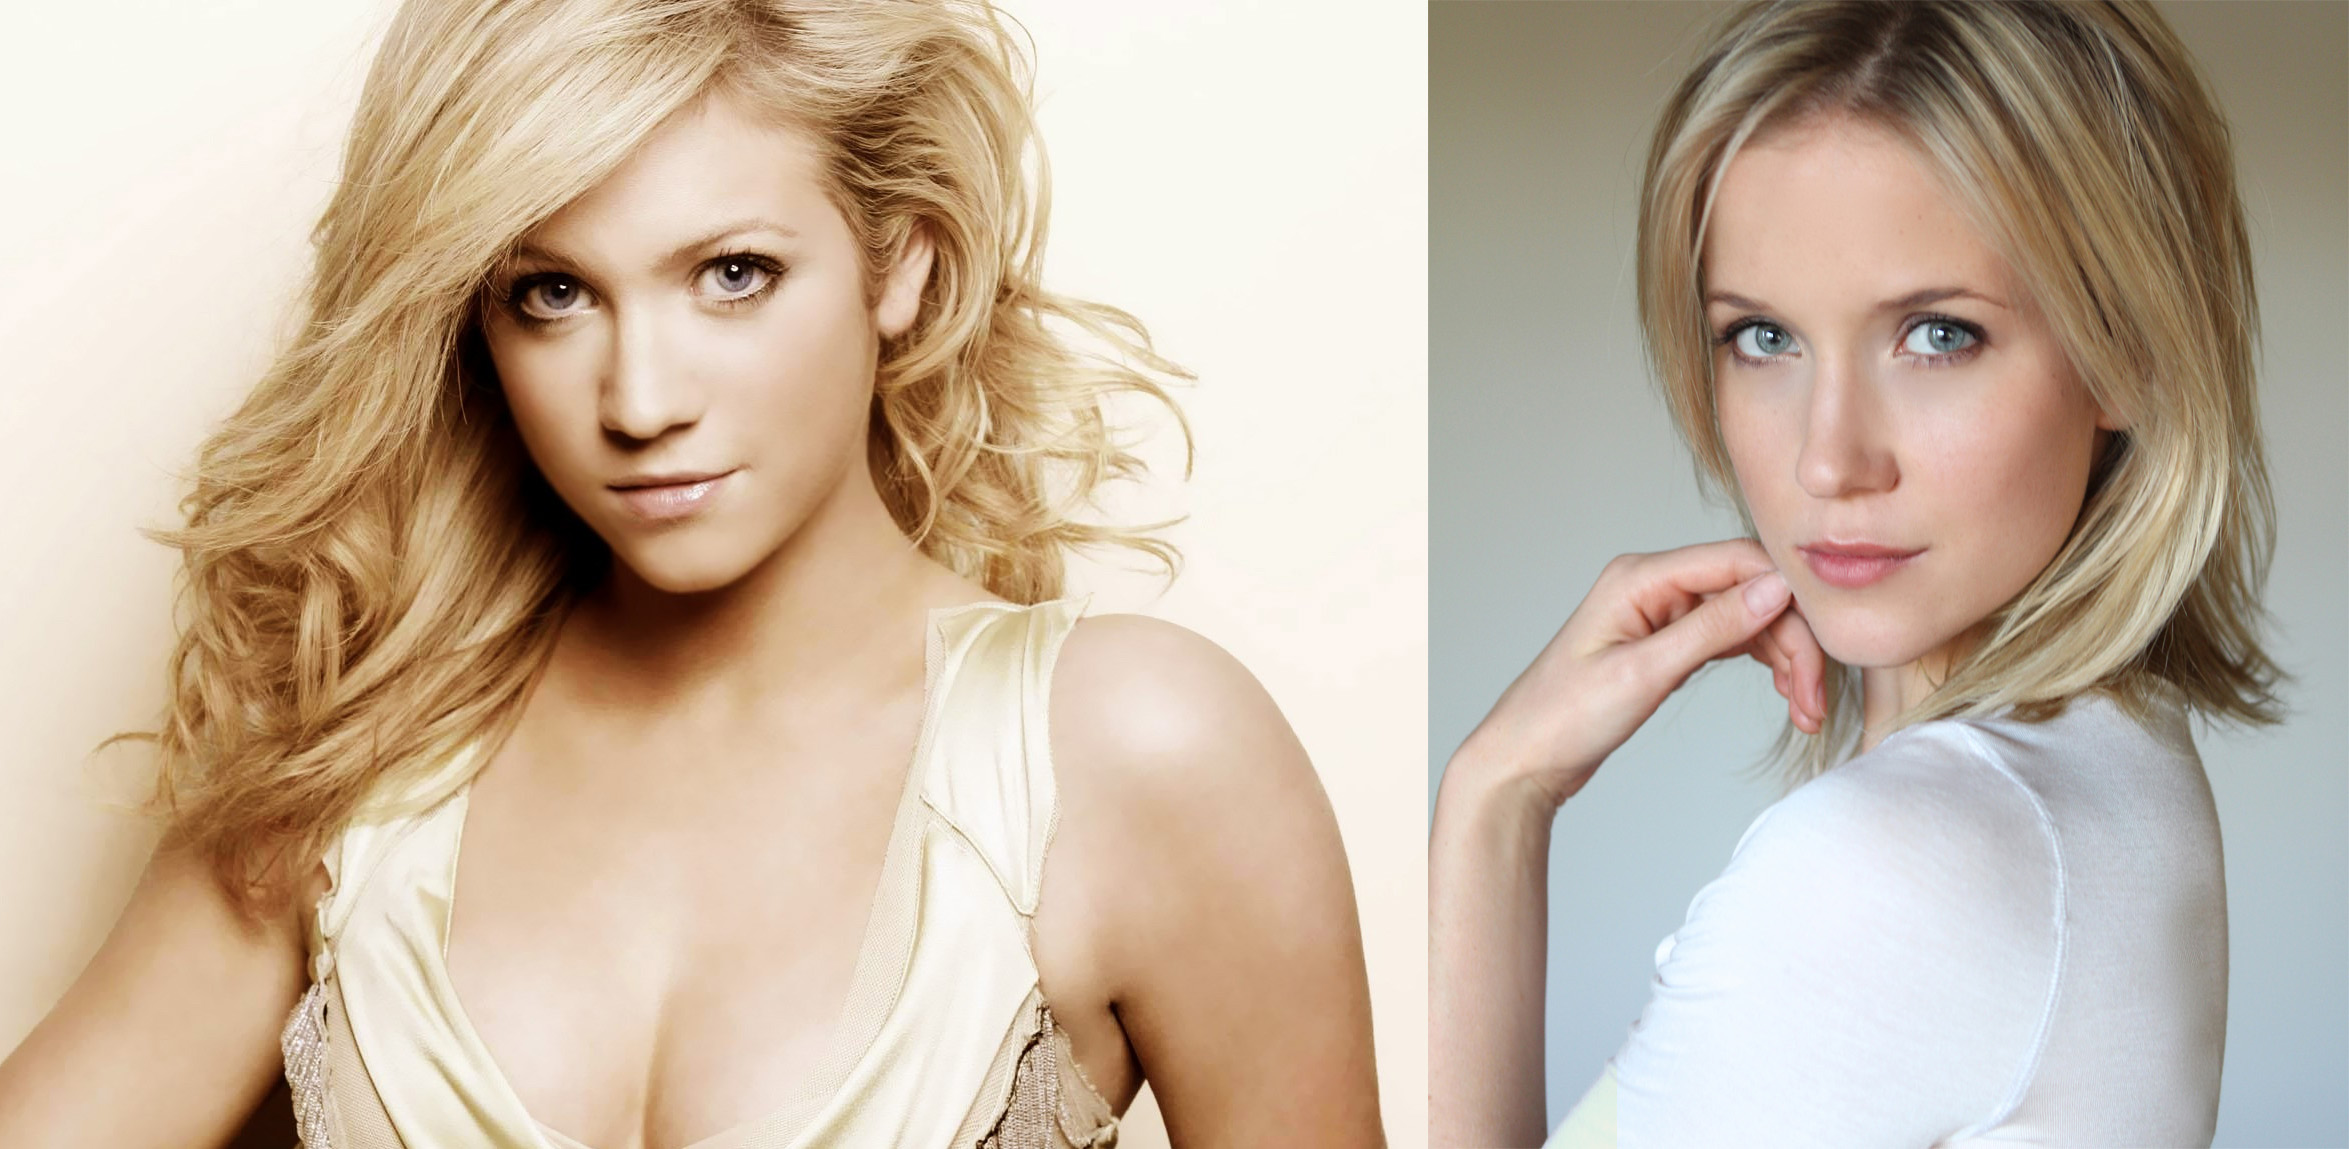 Brittany Snow Look Alikes